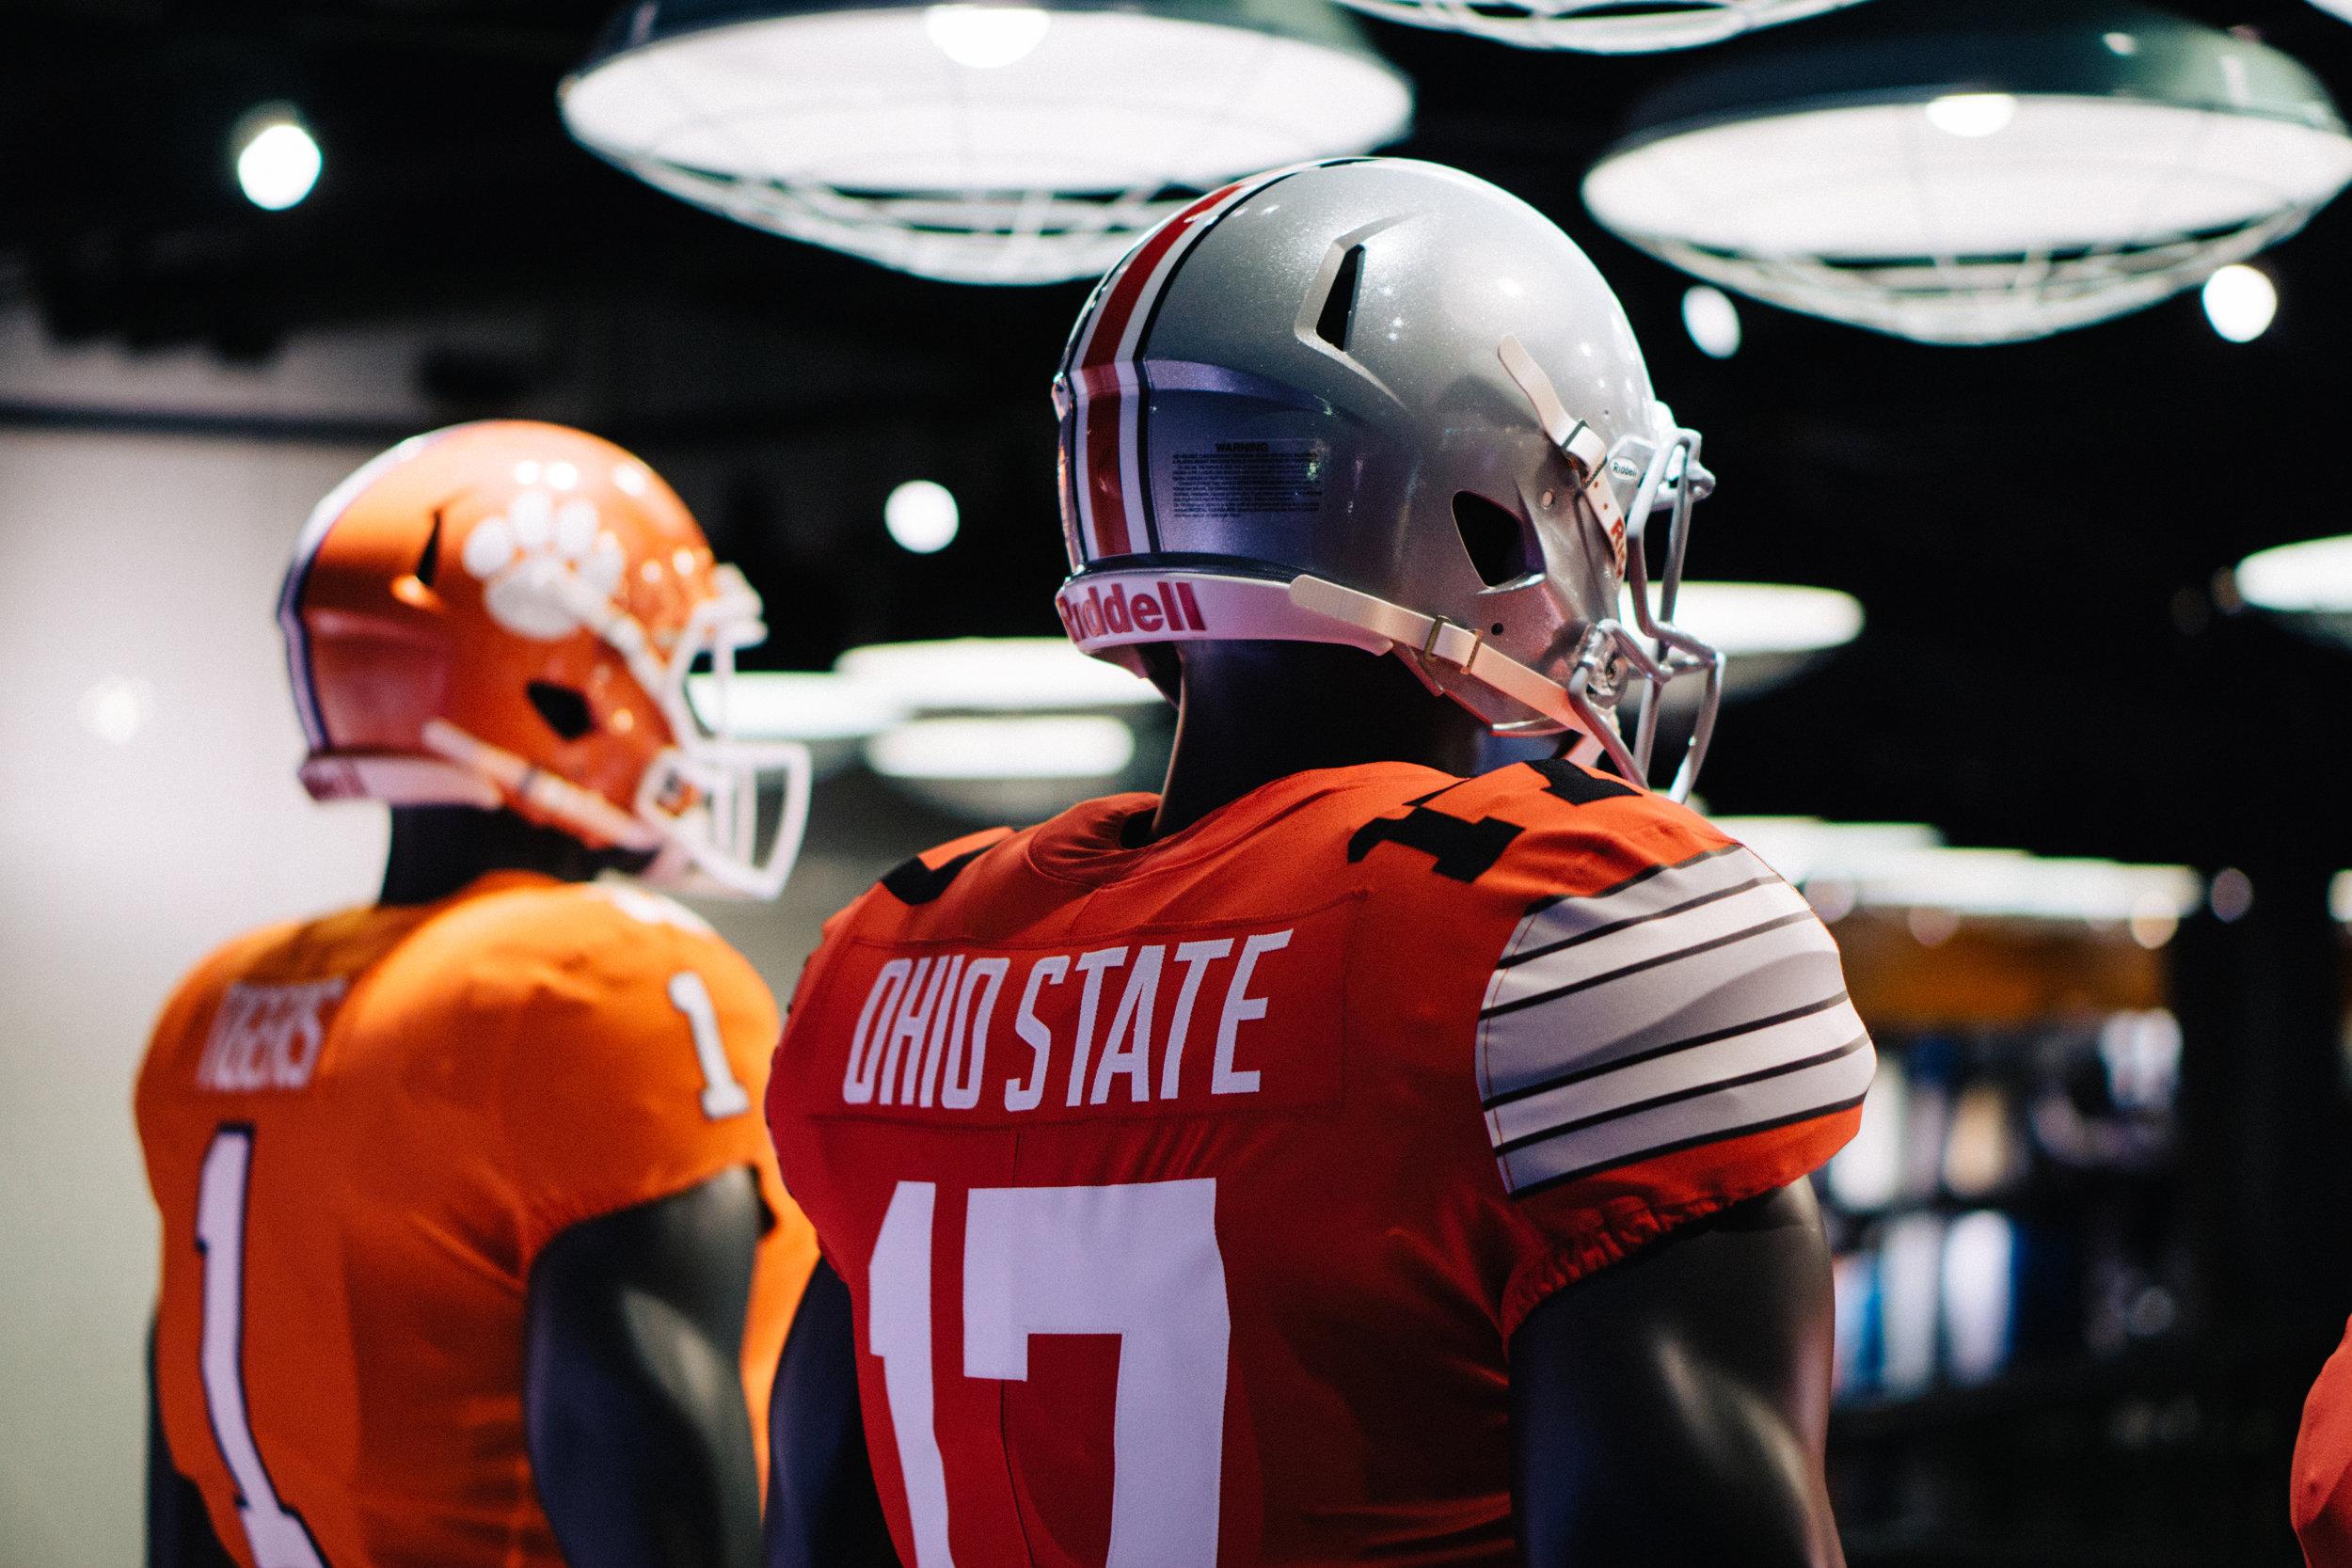 12.30.16 | Ohio State vs Clemson Display at Nike Town - Vegas